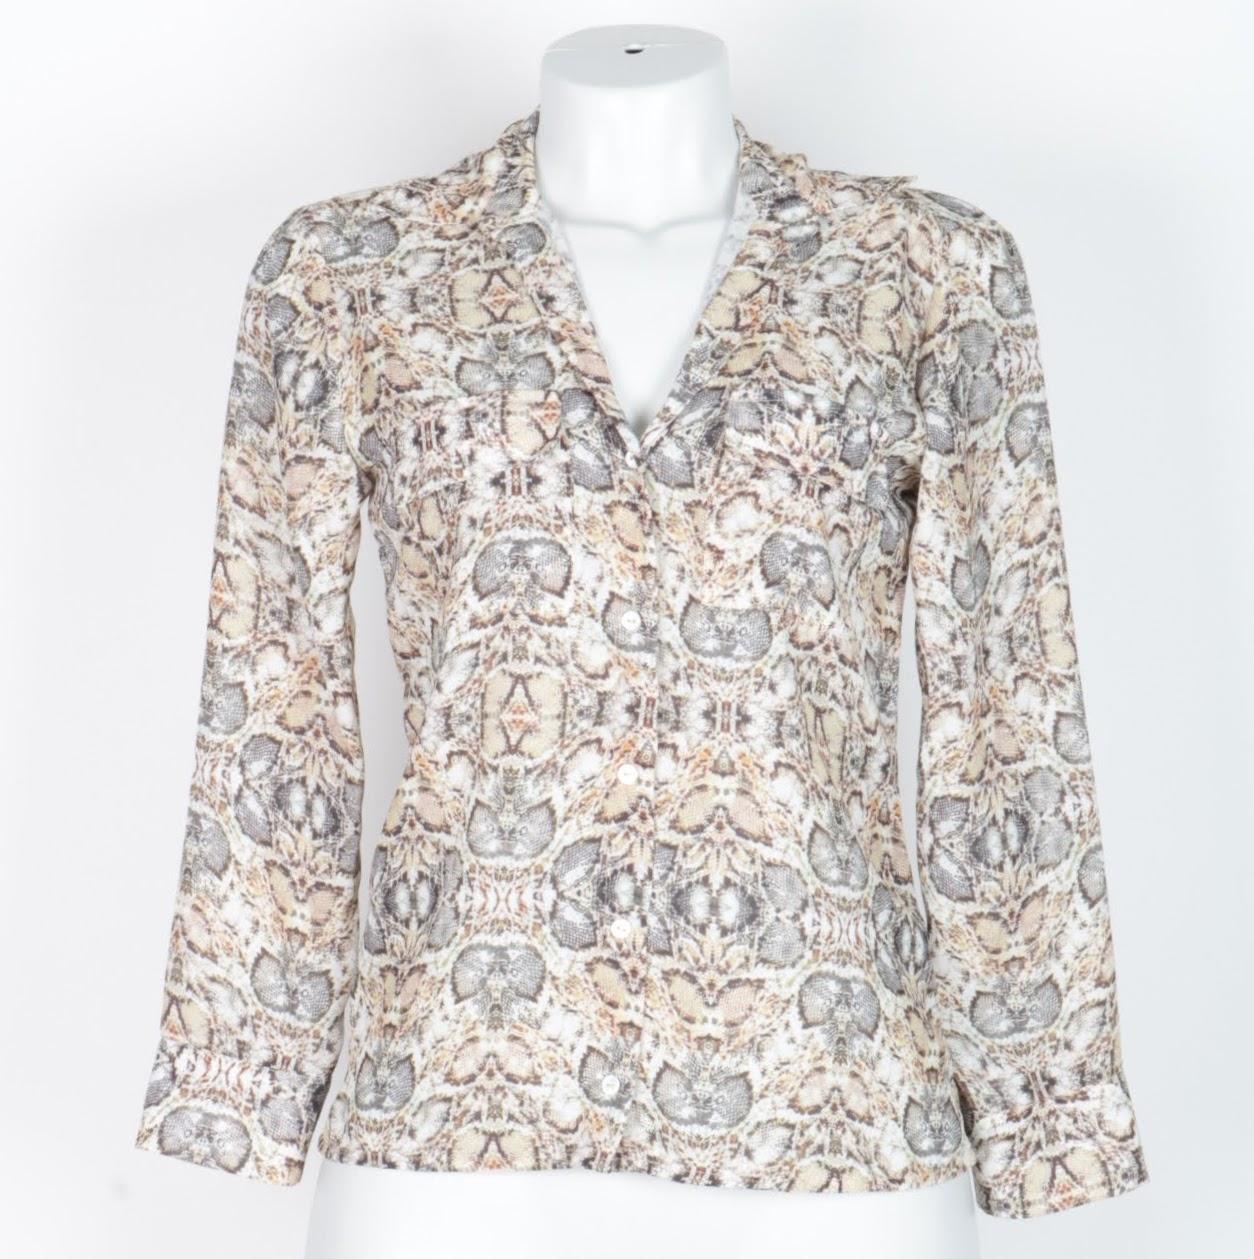 Camisa Manga Longa - Fillity - 36